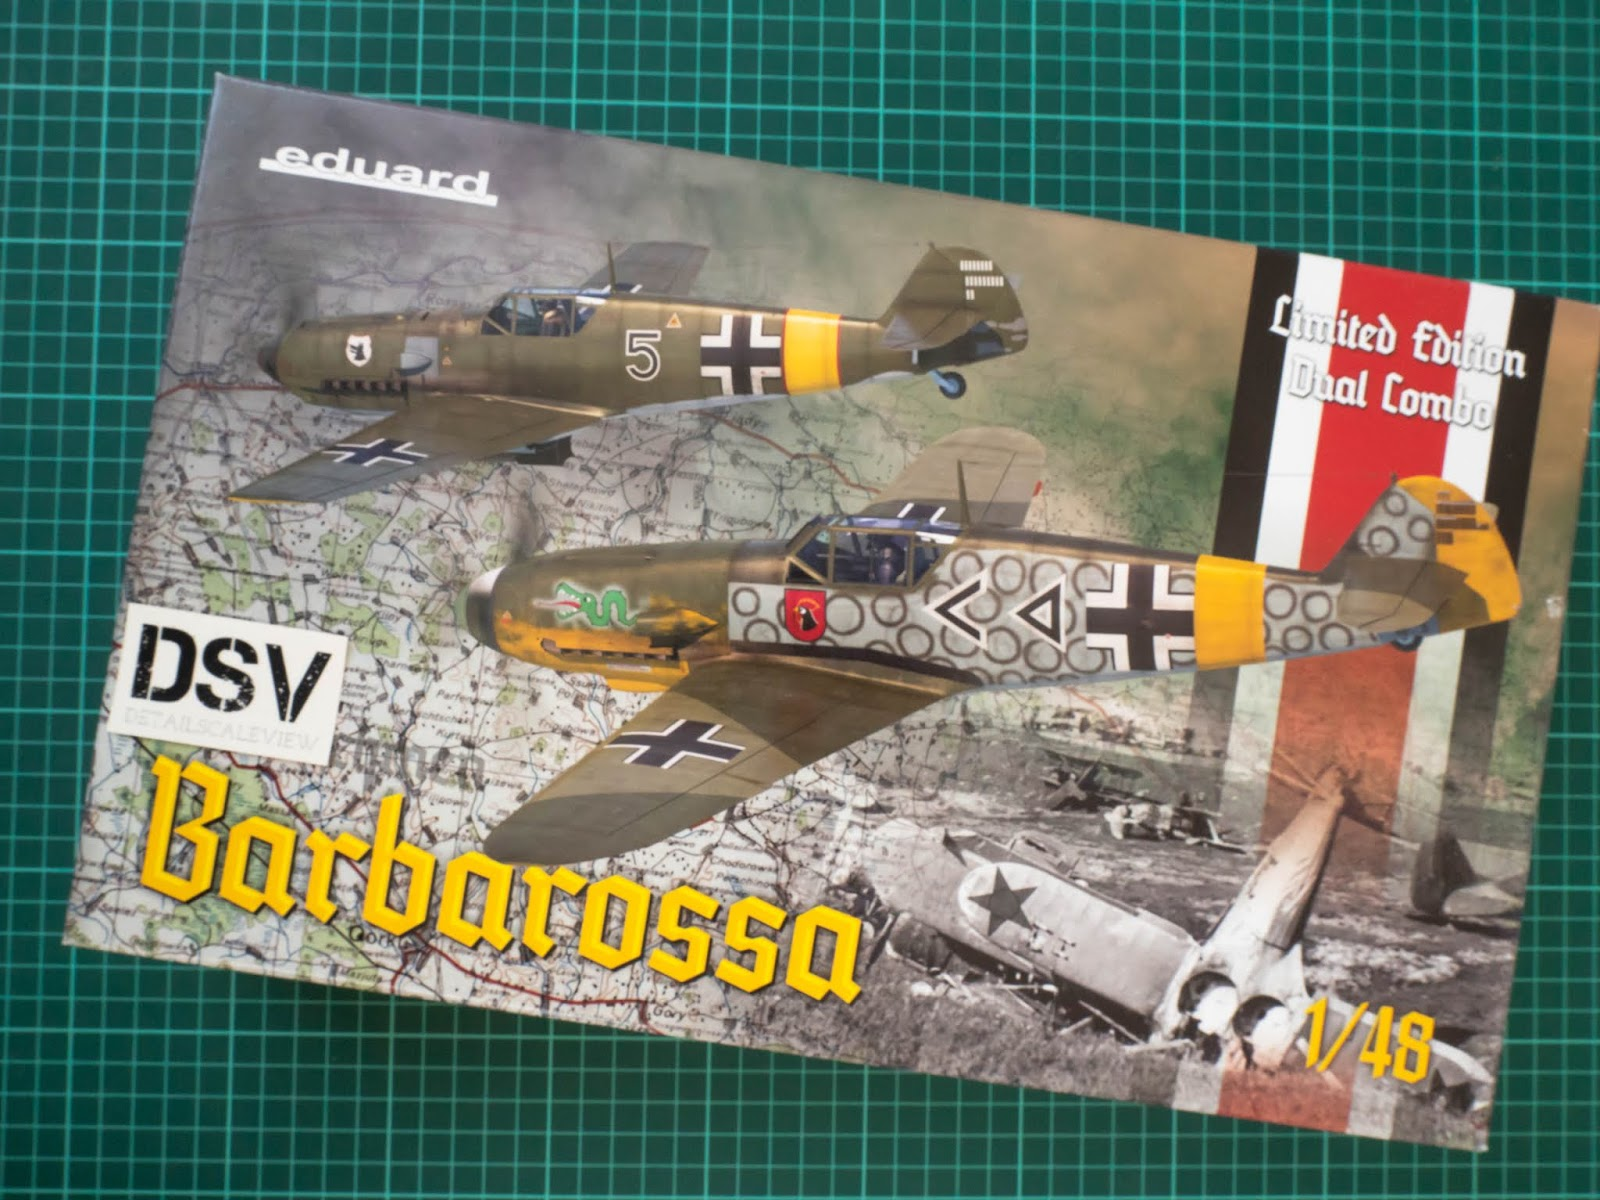 Limited Edition Neu Eduard Plastic Kits 11127-1:48 Barbarossa